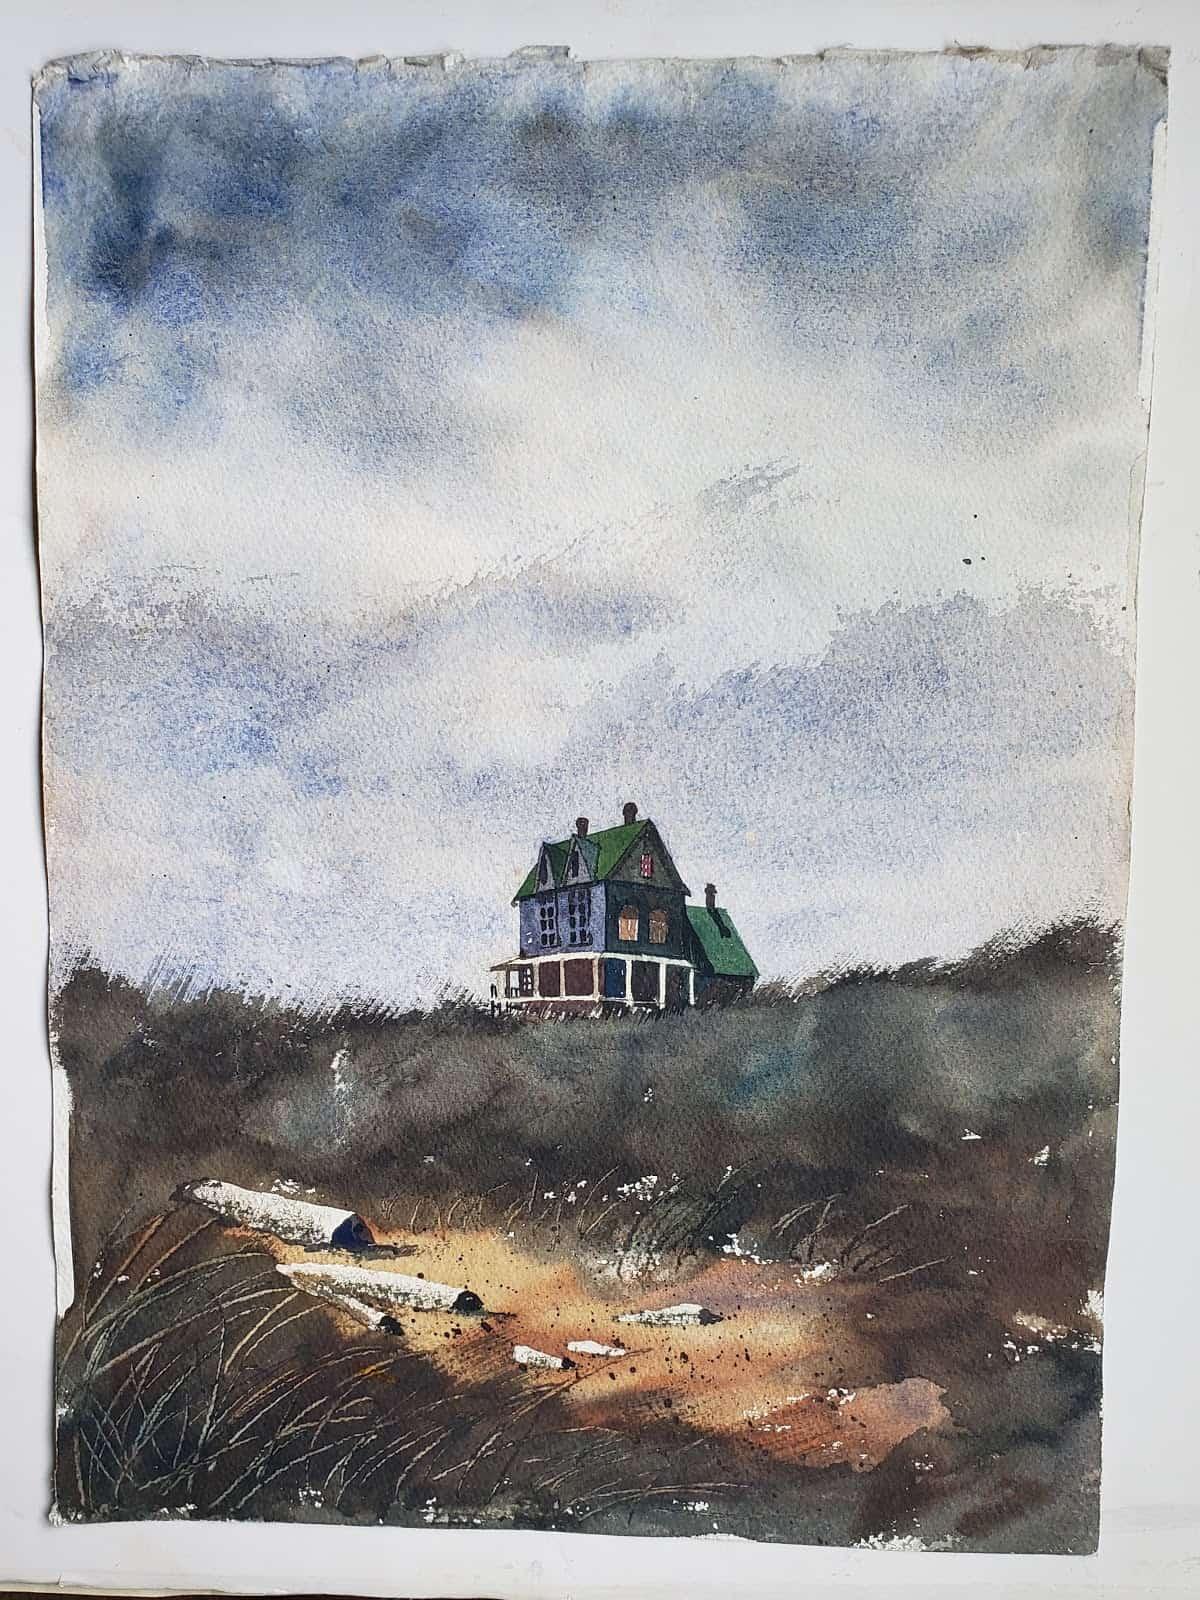 Hot Press or Cold Press Watercolor - Image 6 wet in wet, dry brush, scrape away